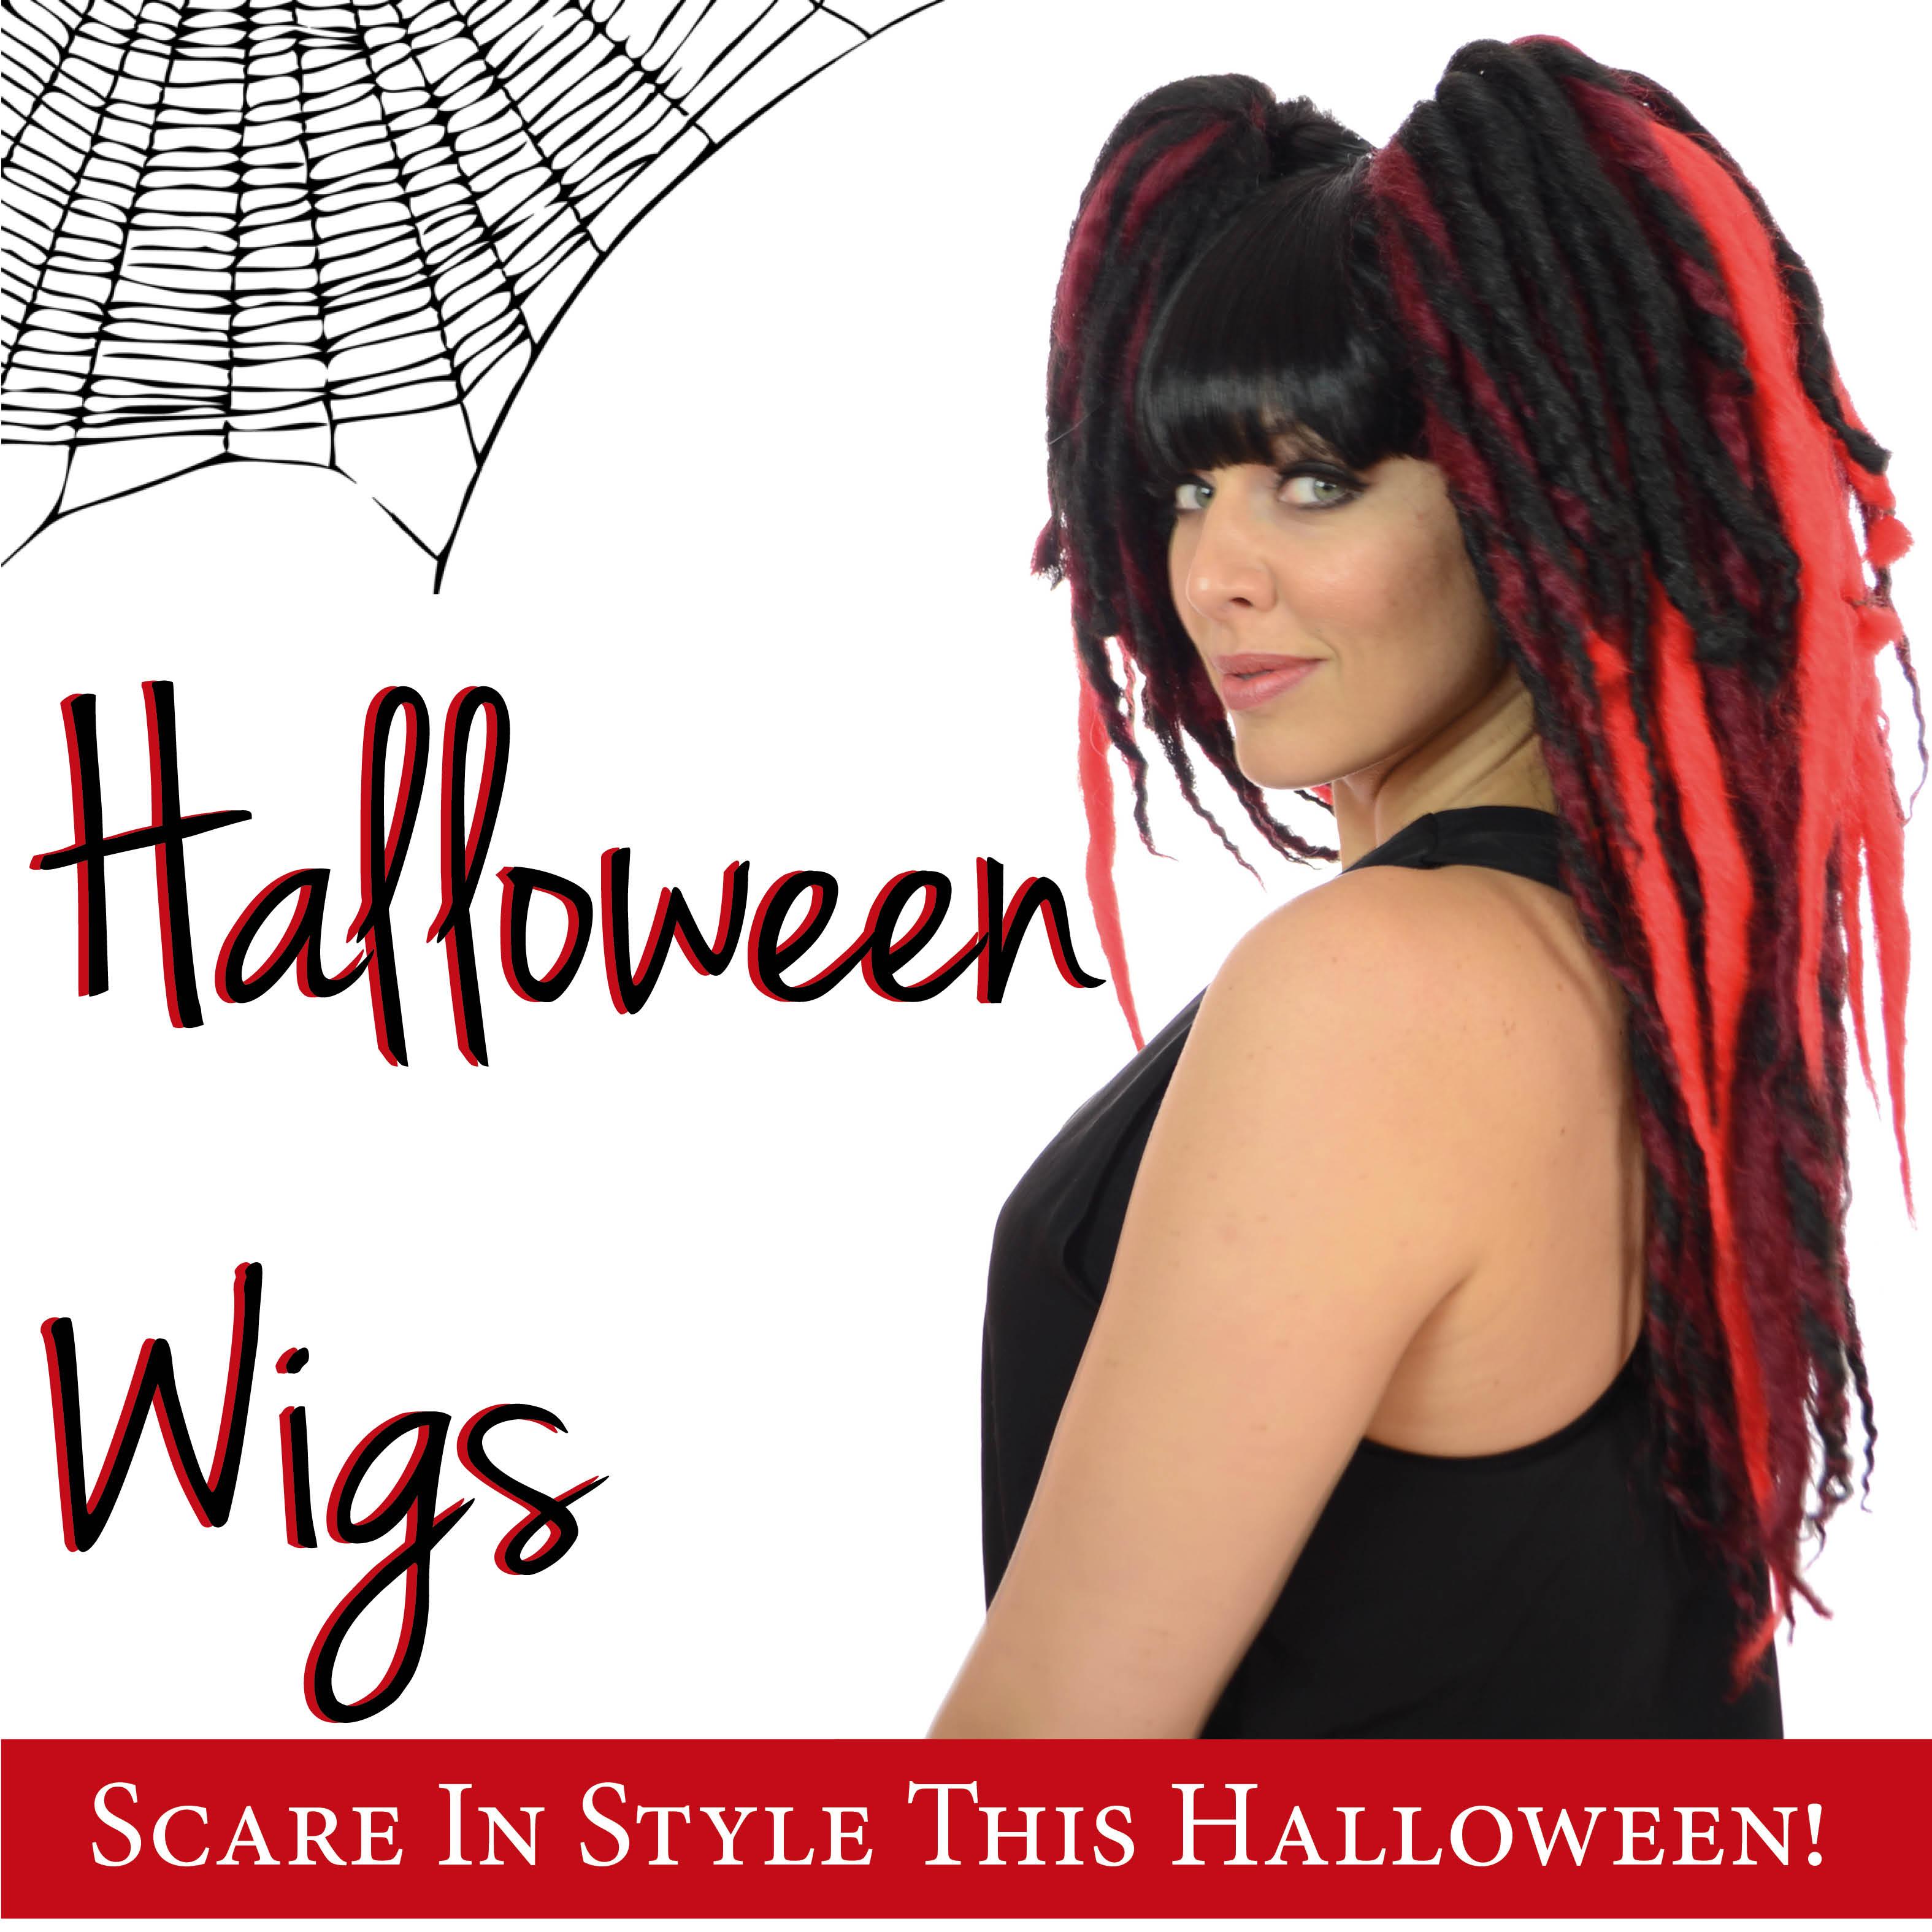 halooween-wigs-1.jpg